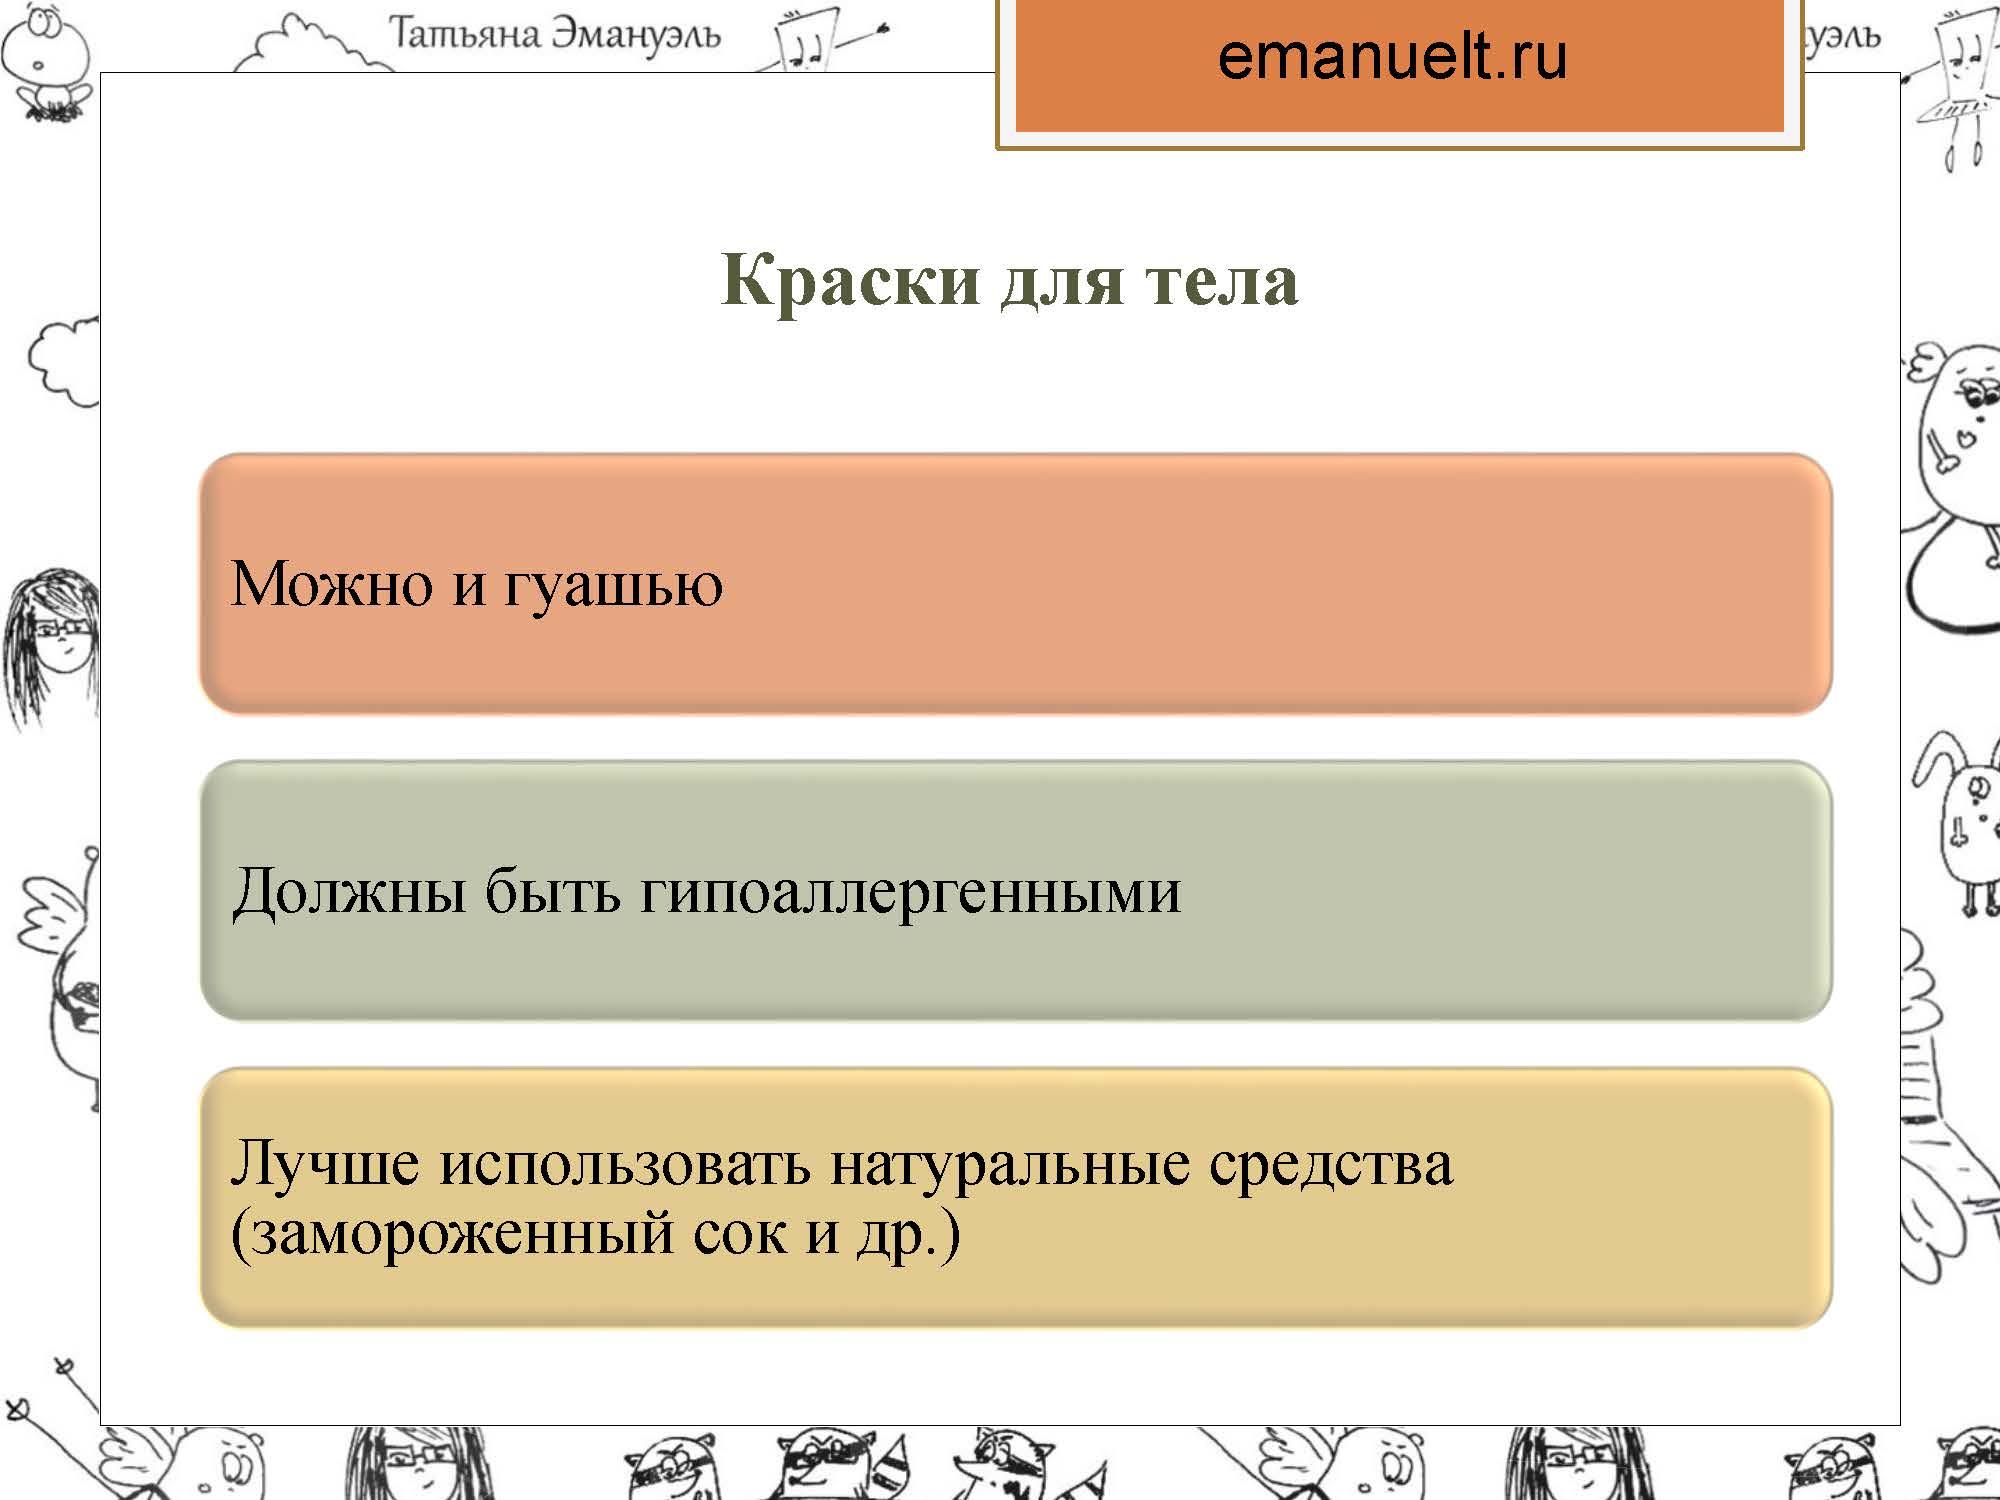 !!!!!!!!на сайт!!!арт!_Страница_094